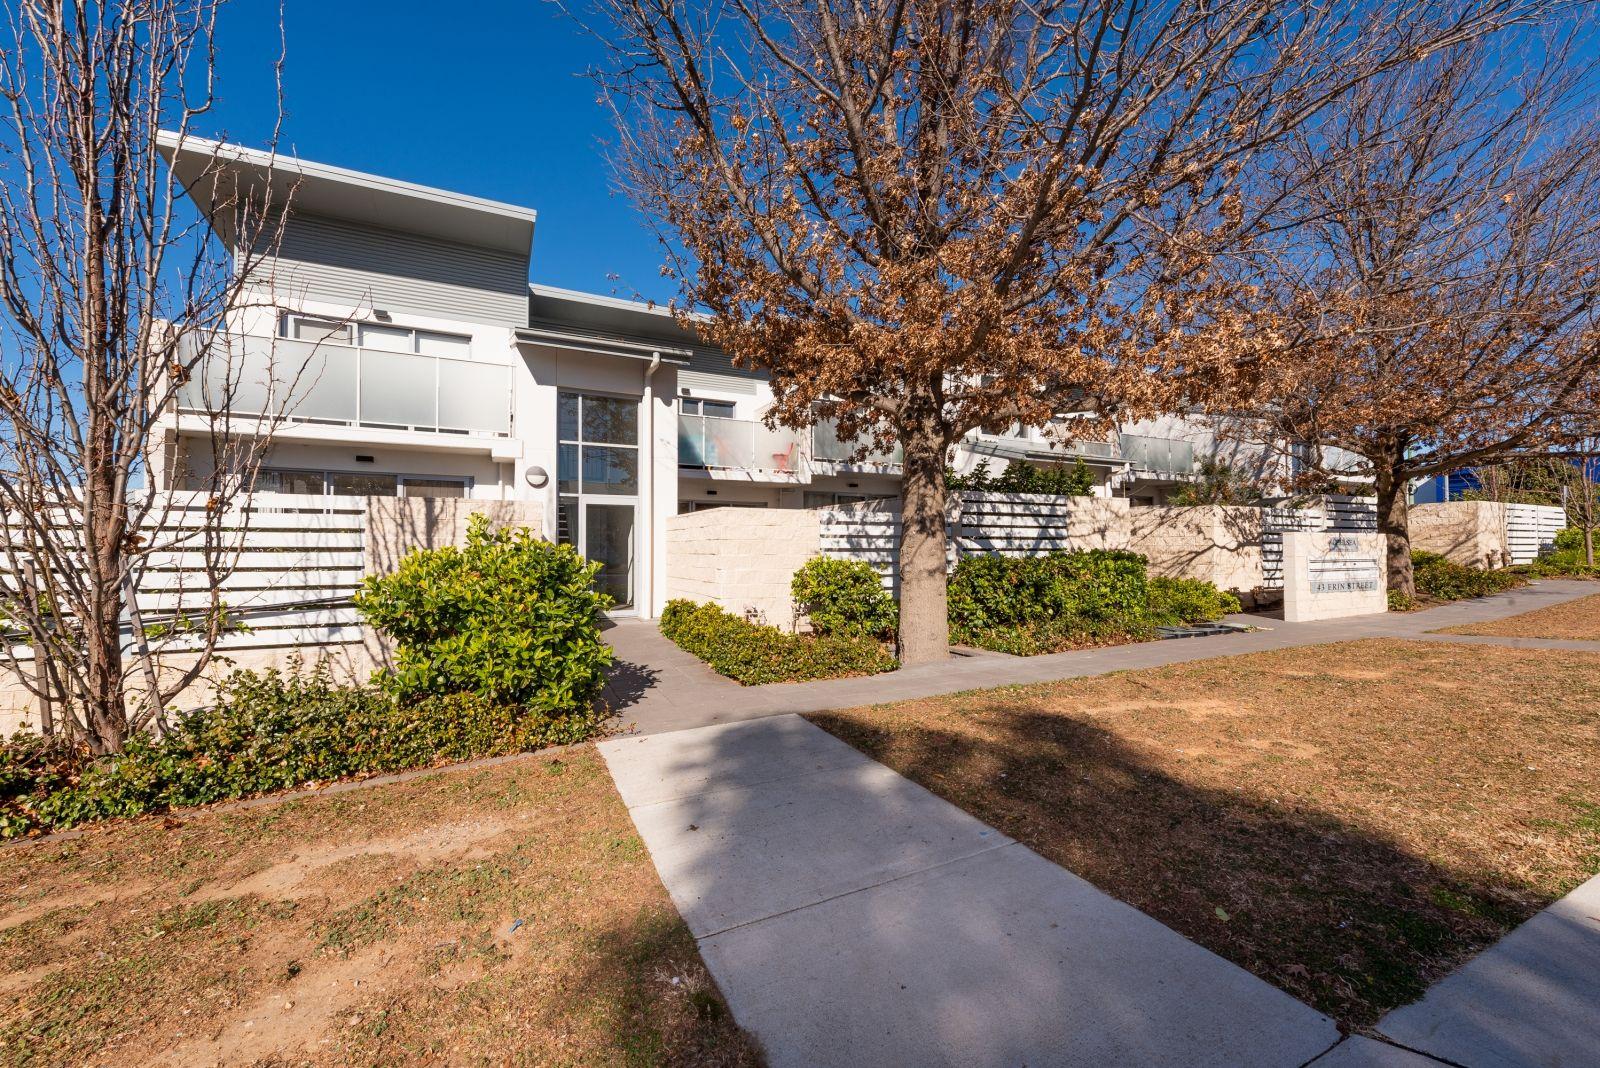 5/43 Erin Street, Queanbeyan NSW 2620, Image 0